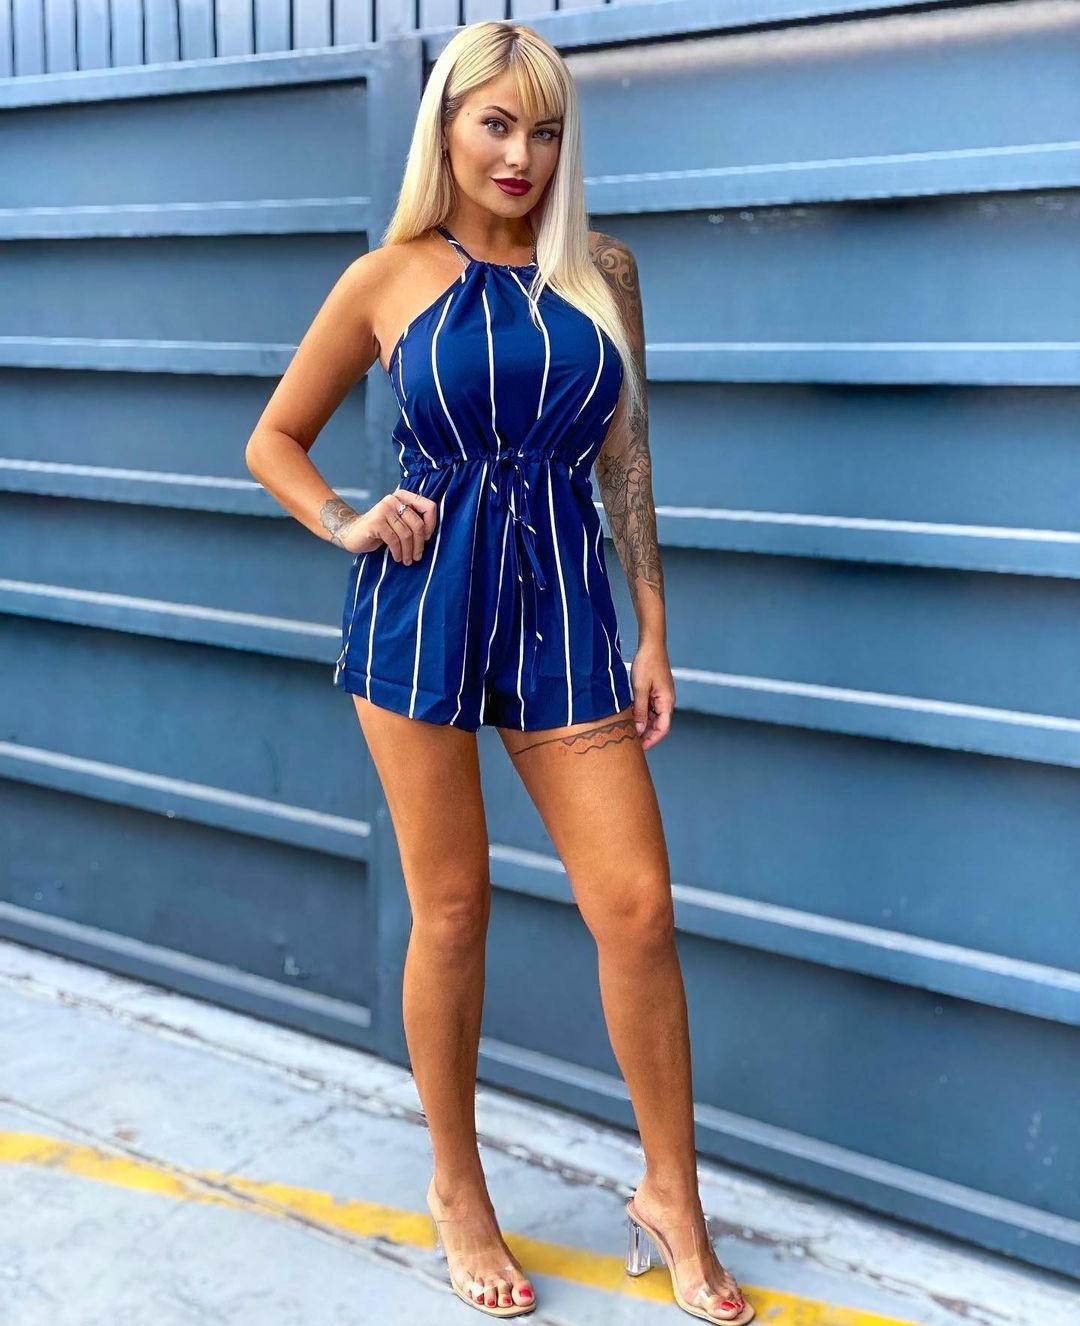 Blonde Spanish Woman